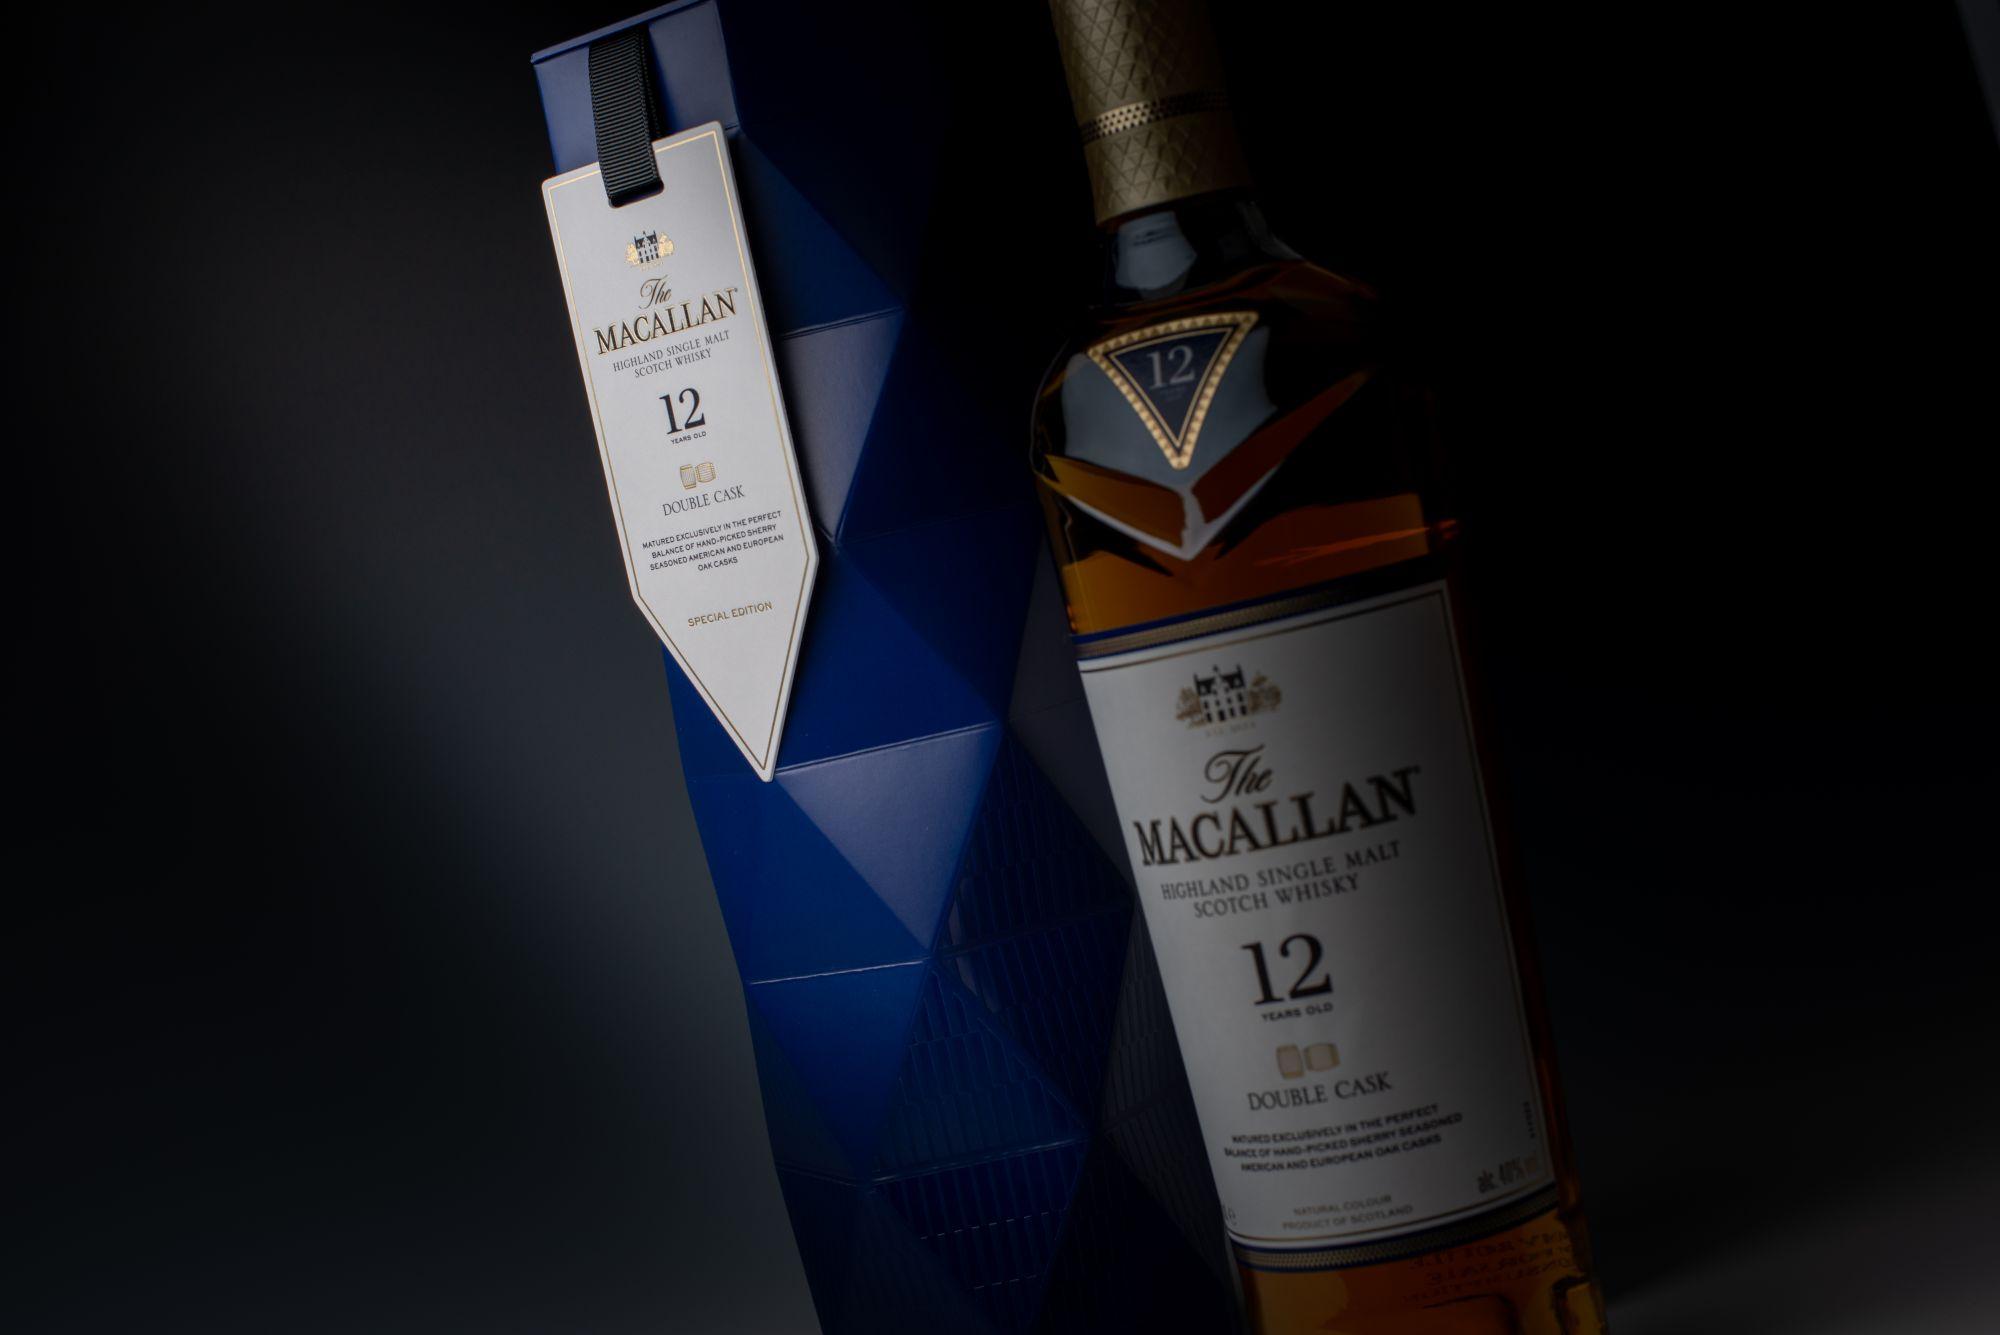 The Macallan 新酒廠週年推出全球限量包裝!全台認證零售商獨家販售